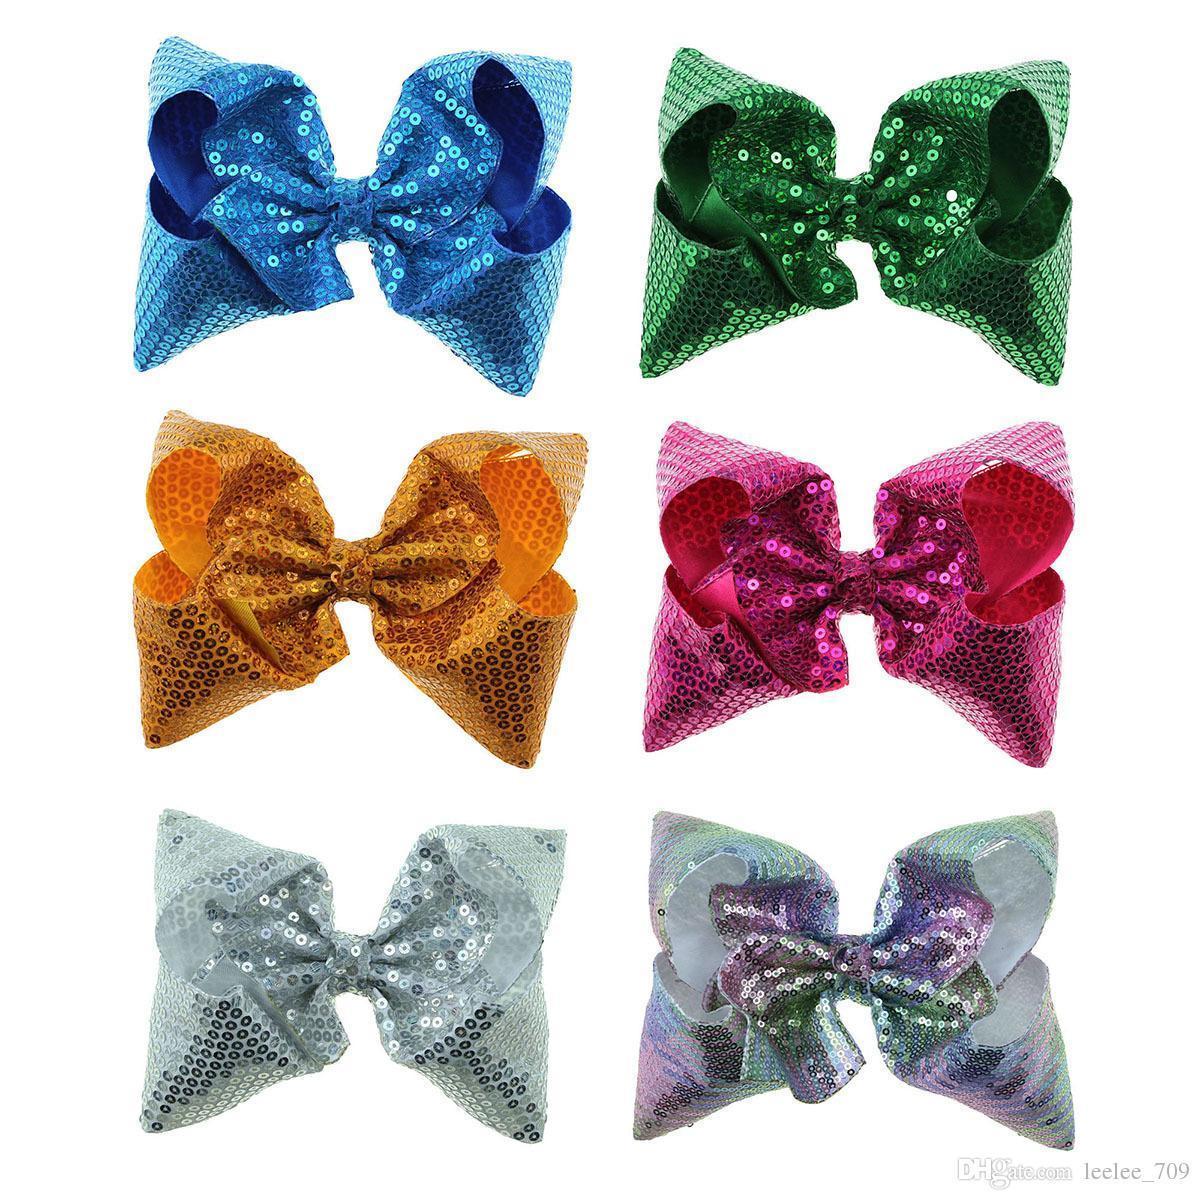 20Pcs Baby M/ädchen Kinder Haarschleife Boutique Alligator Clip Grosgrain Ribbon Bowknot